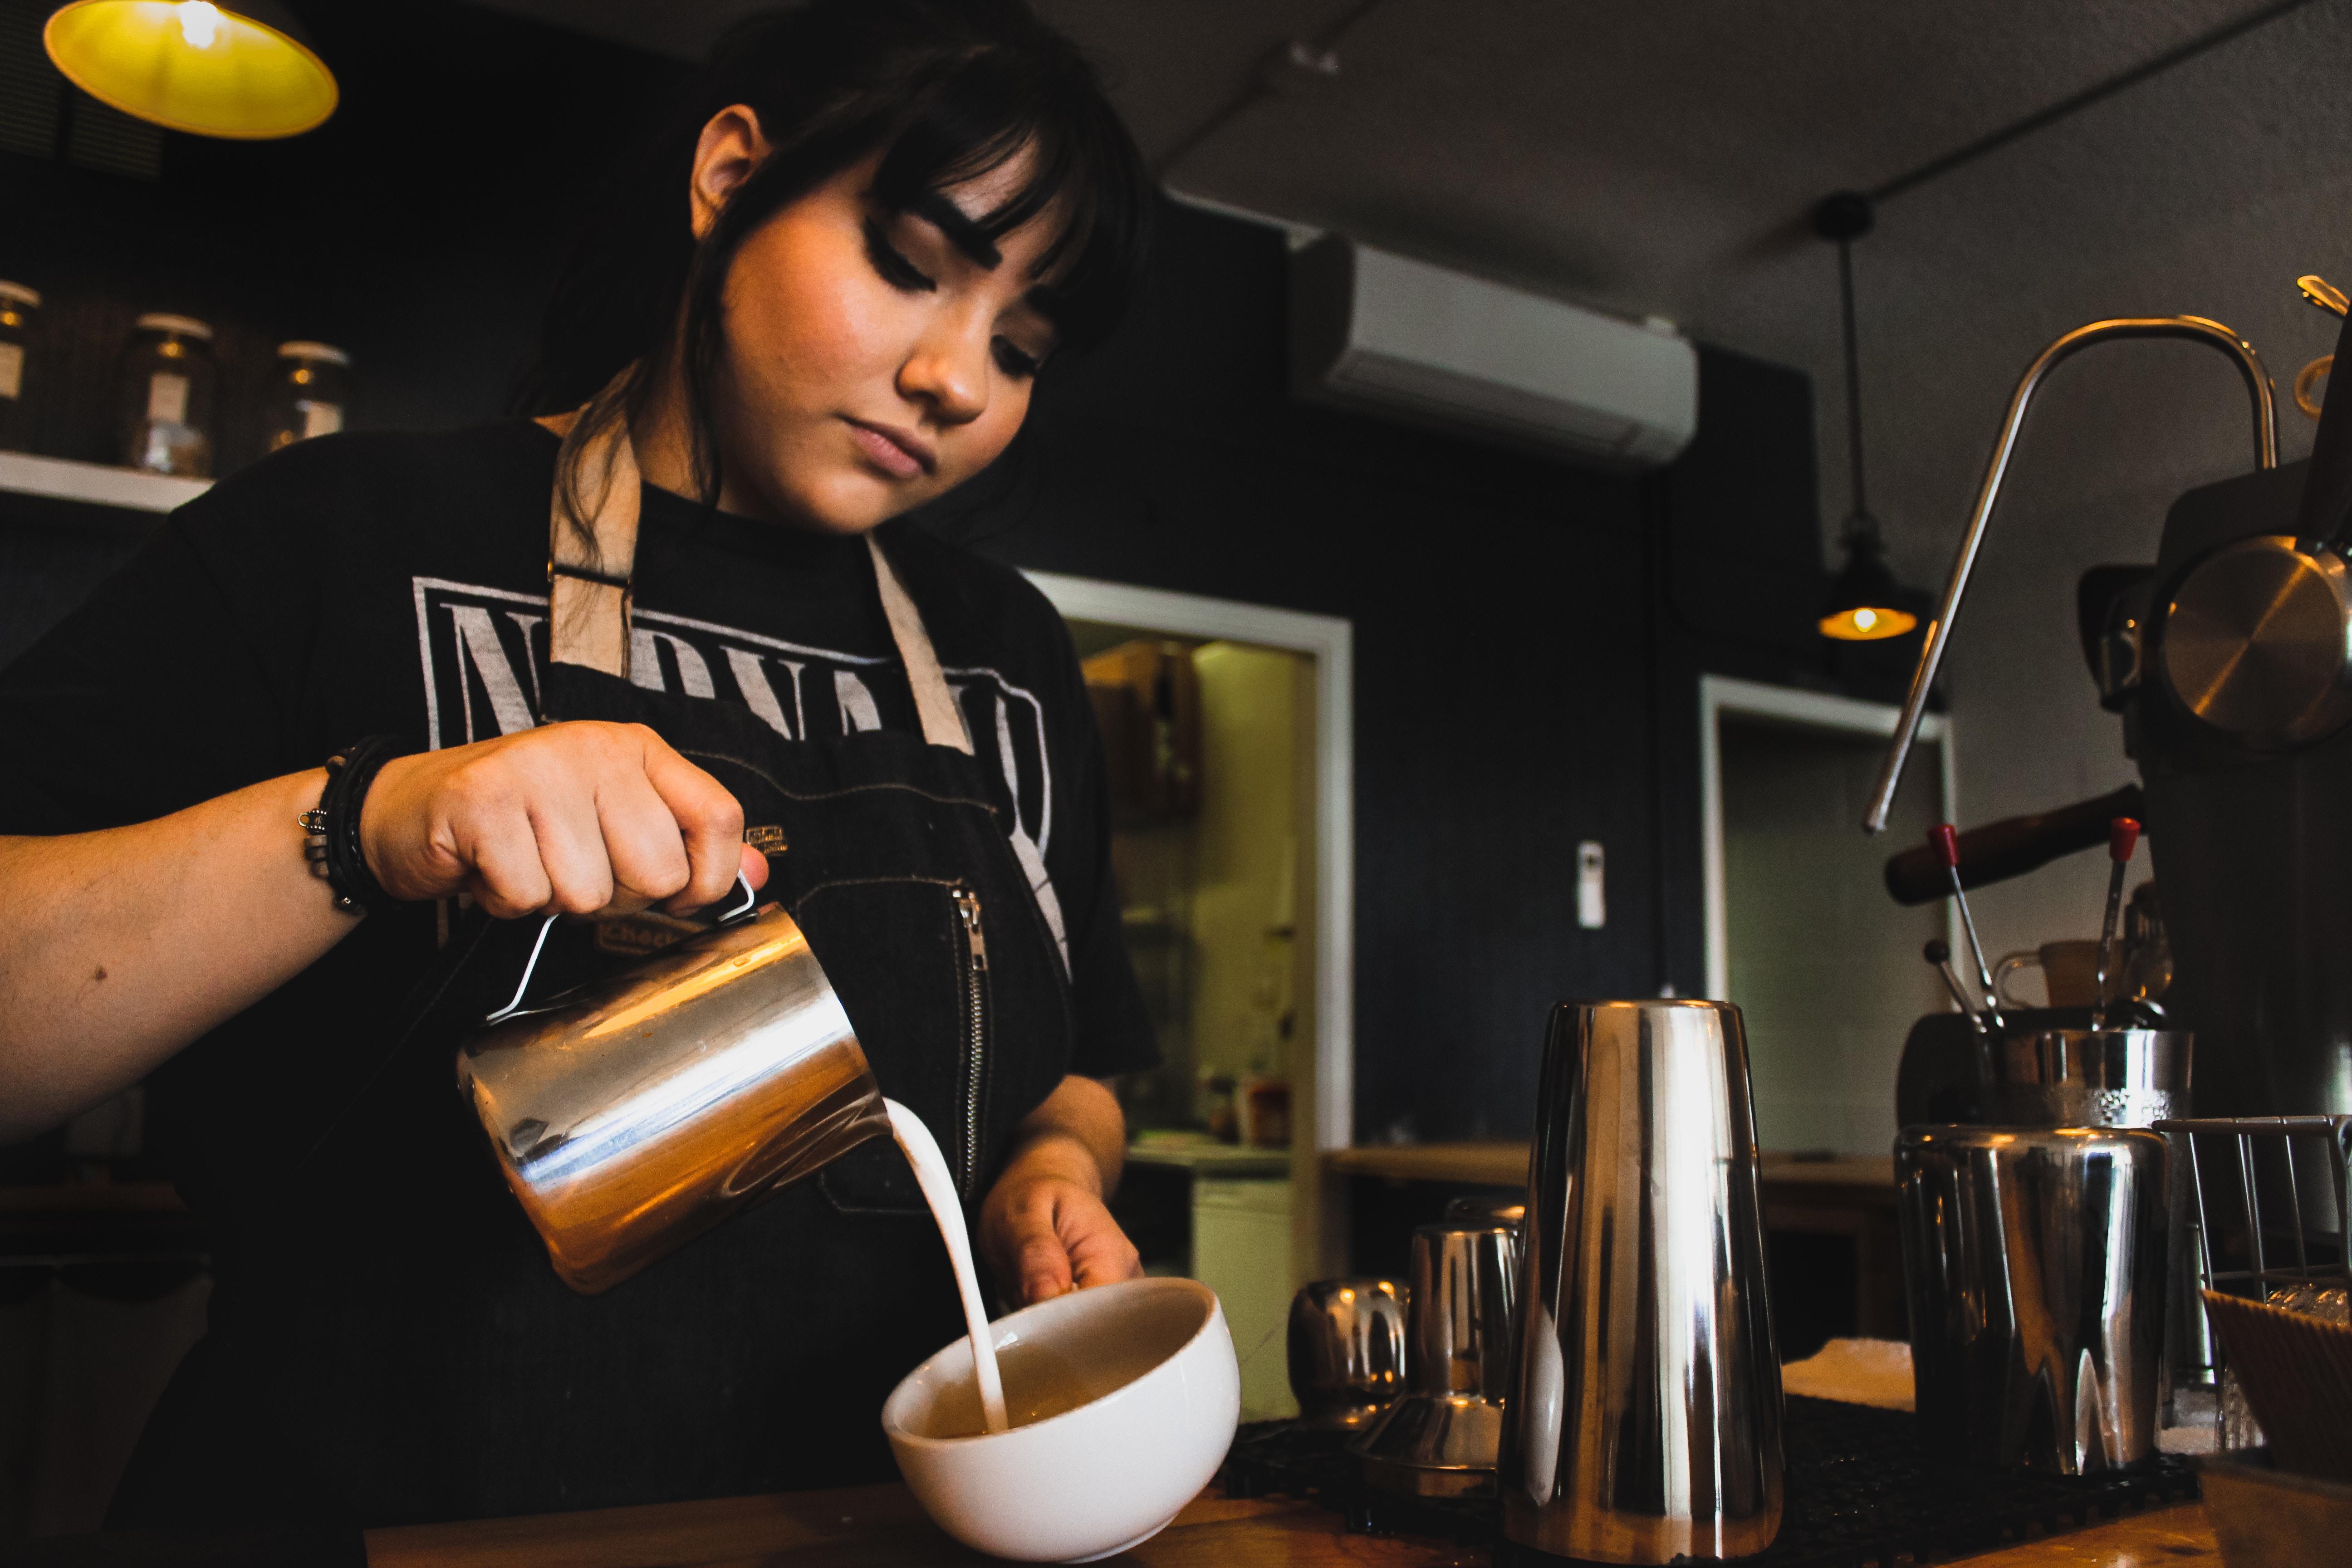 Starbucks Gastronomie-Kurs: Info-Abend #2